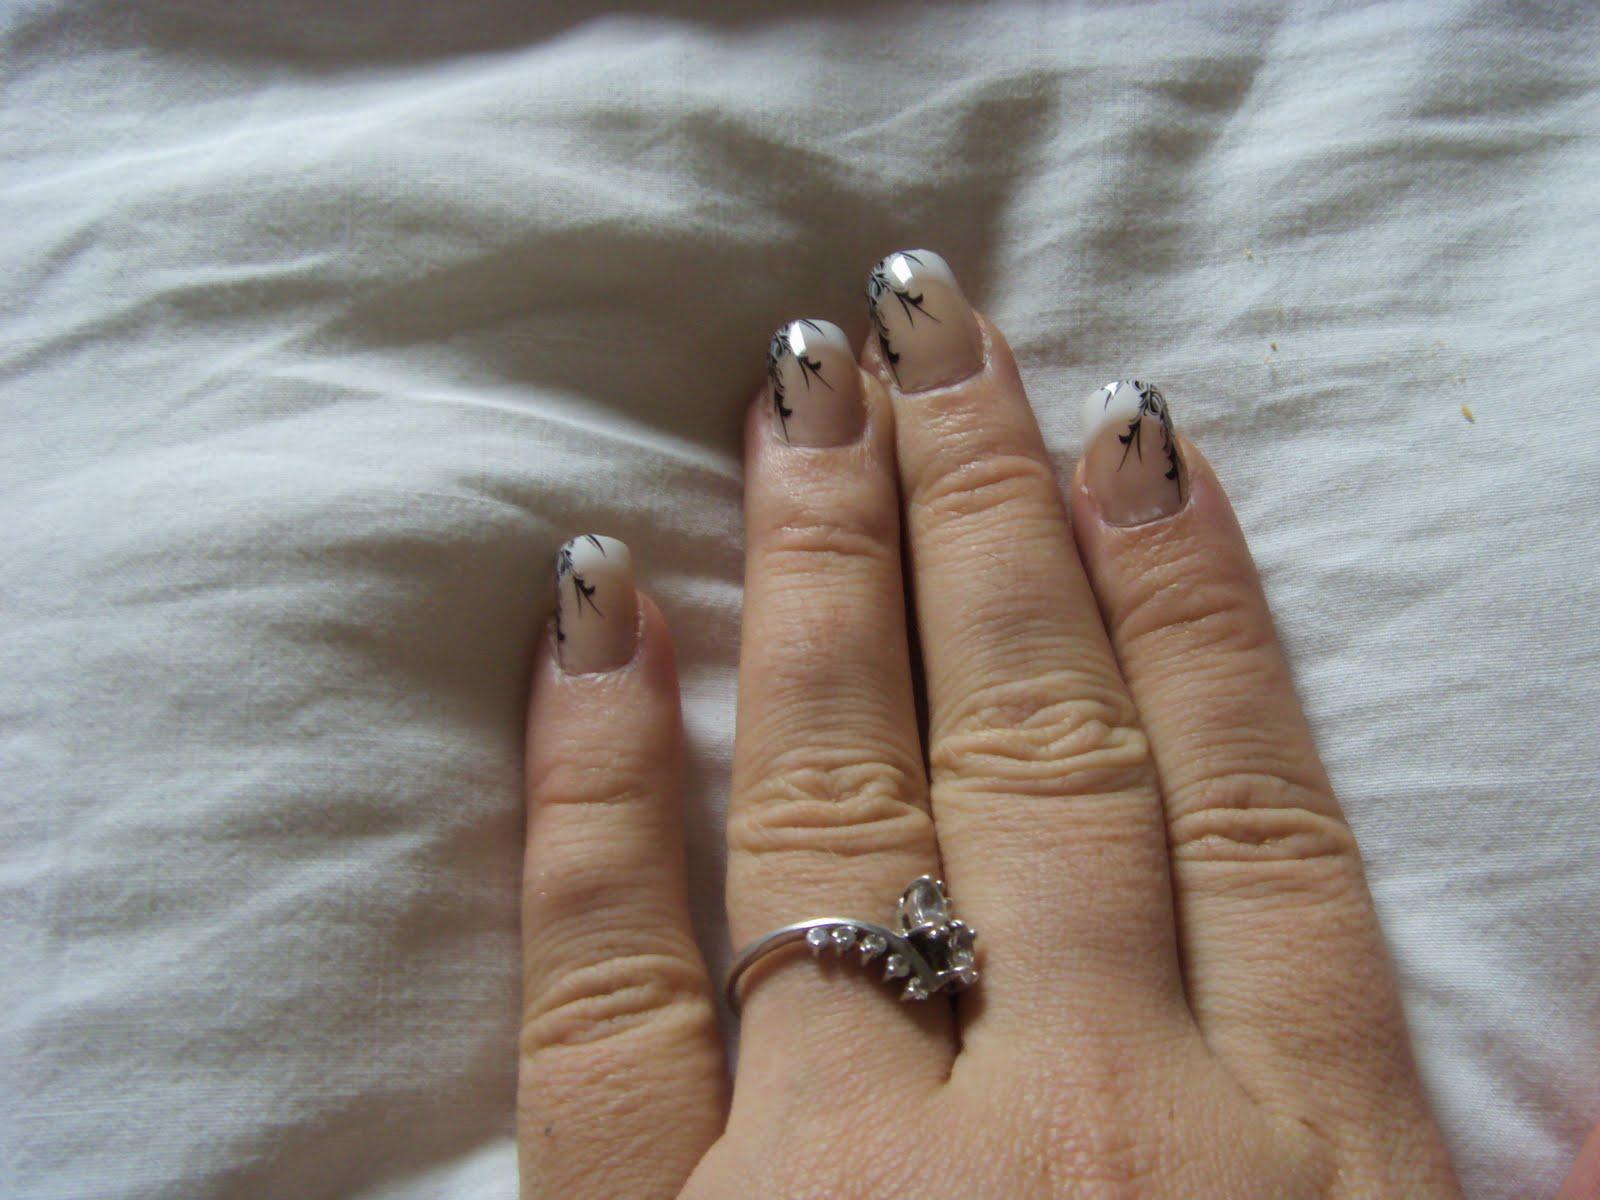 produits claire 39 s faux ongles claire 39 s. Black Bedroom Furniture Sets. Home Design Ideas